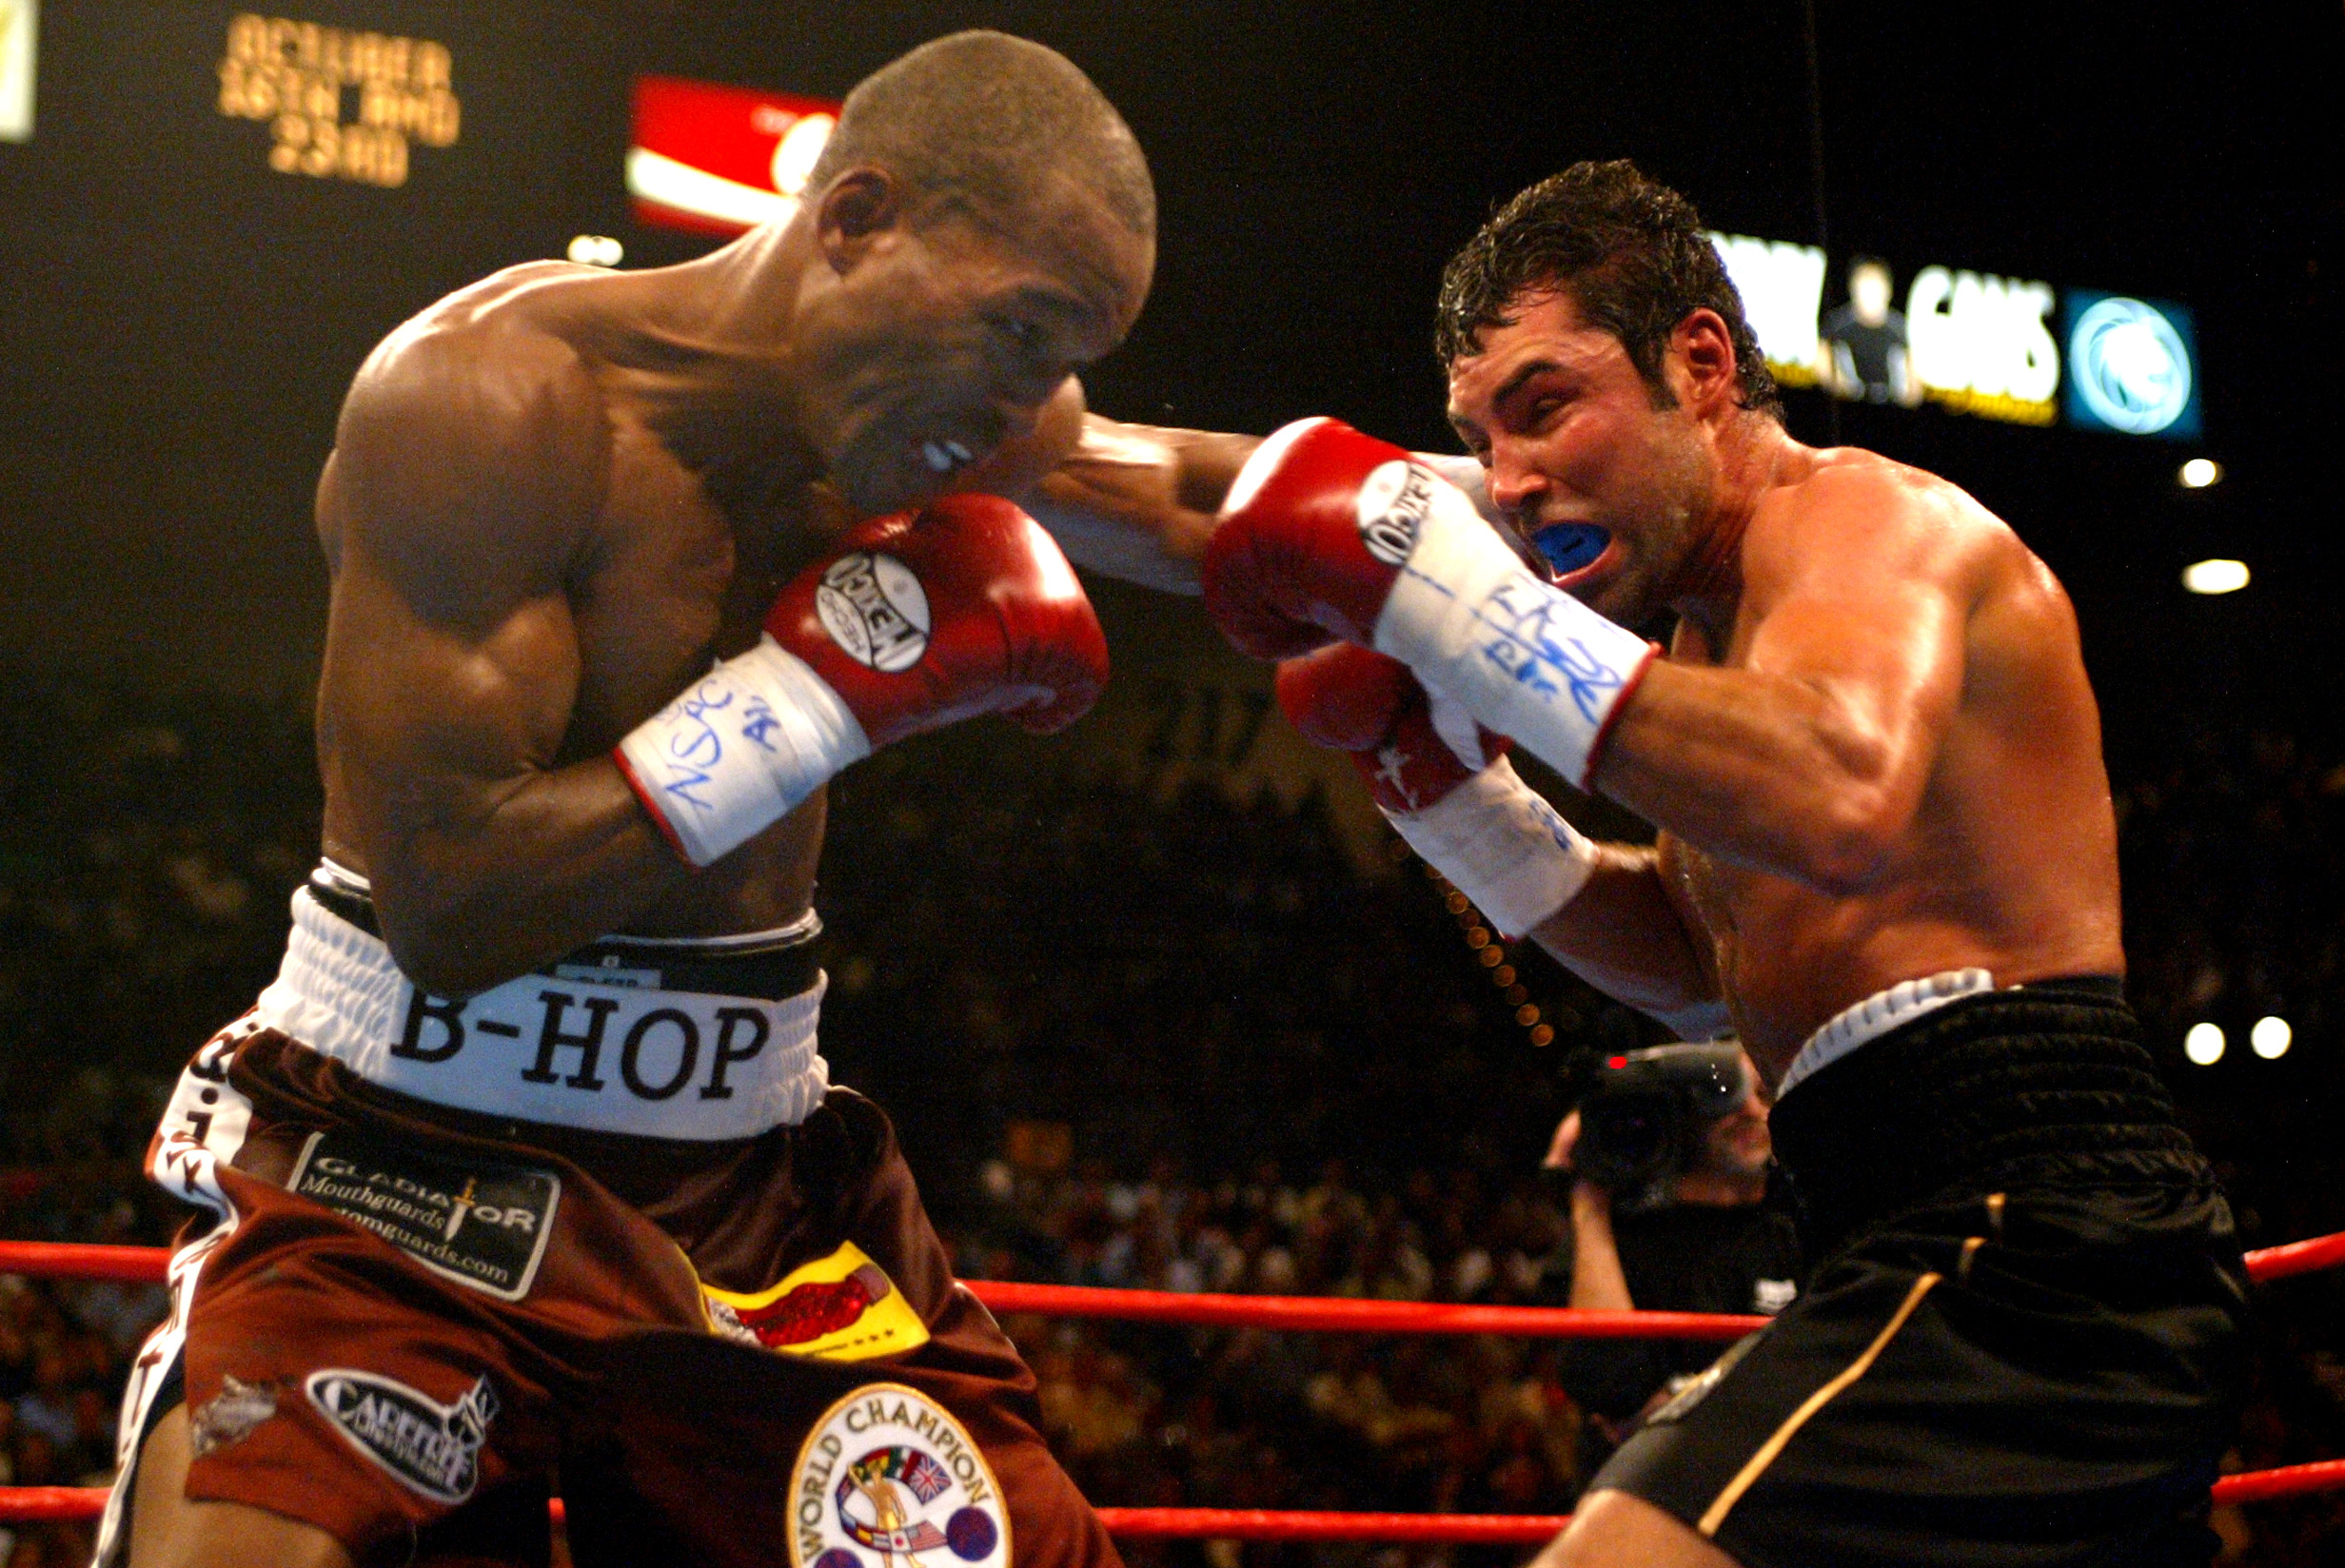 Boxing 2004 - Bernard Hopkins vs. Oscar de la Hoya